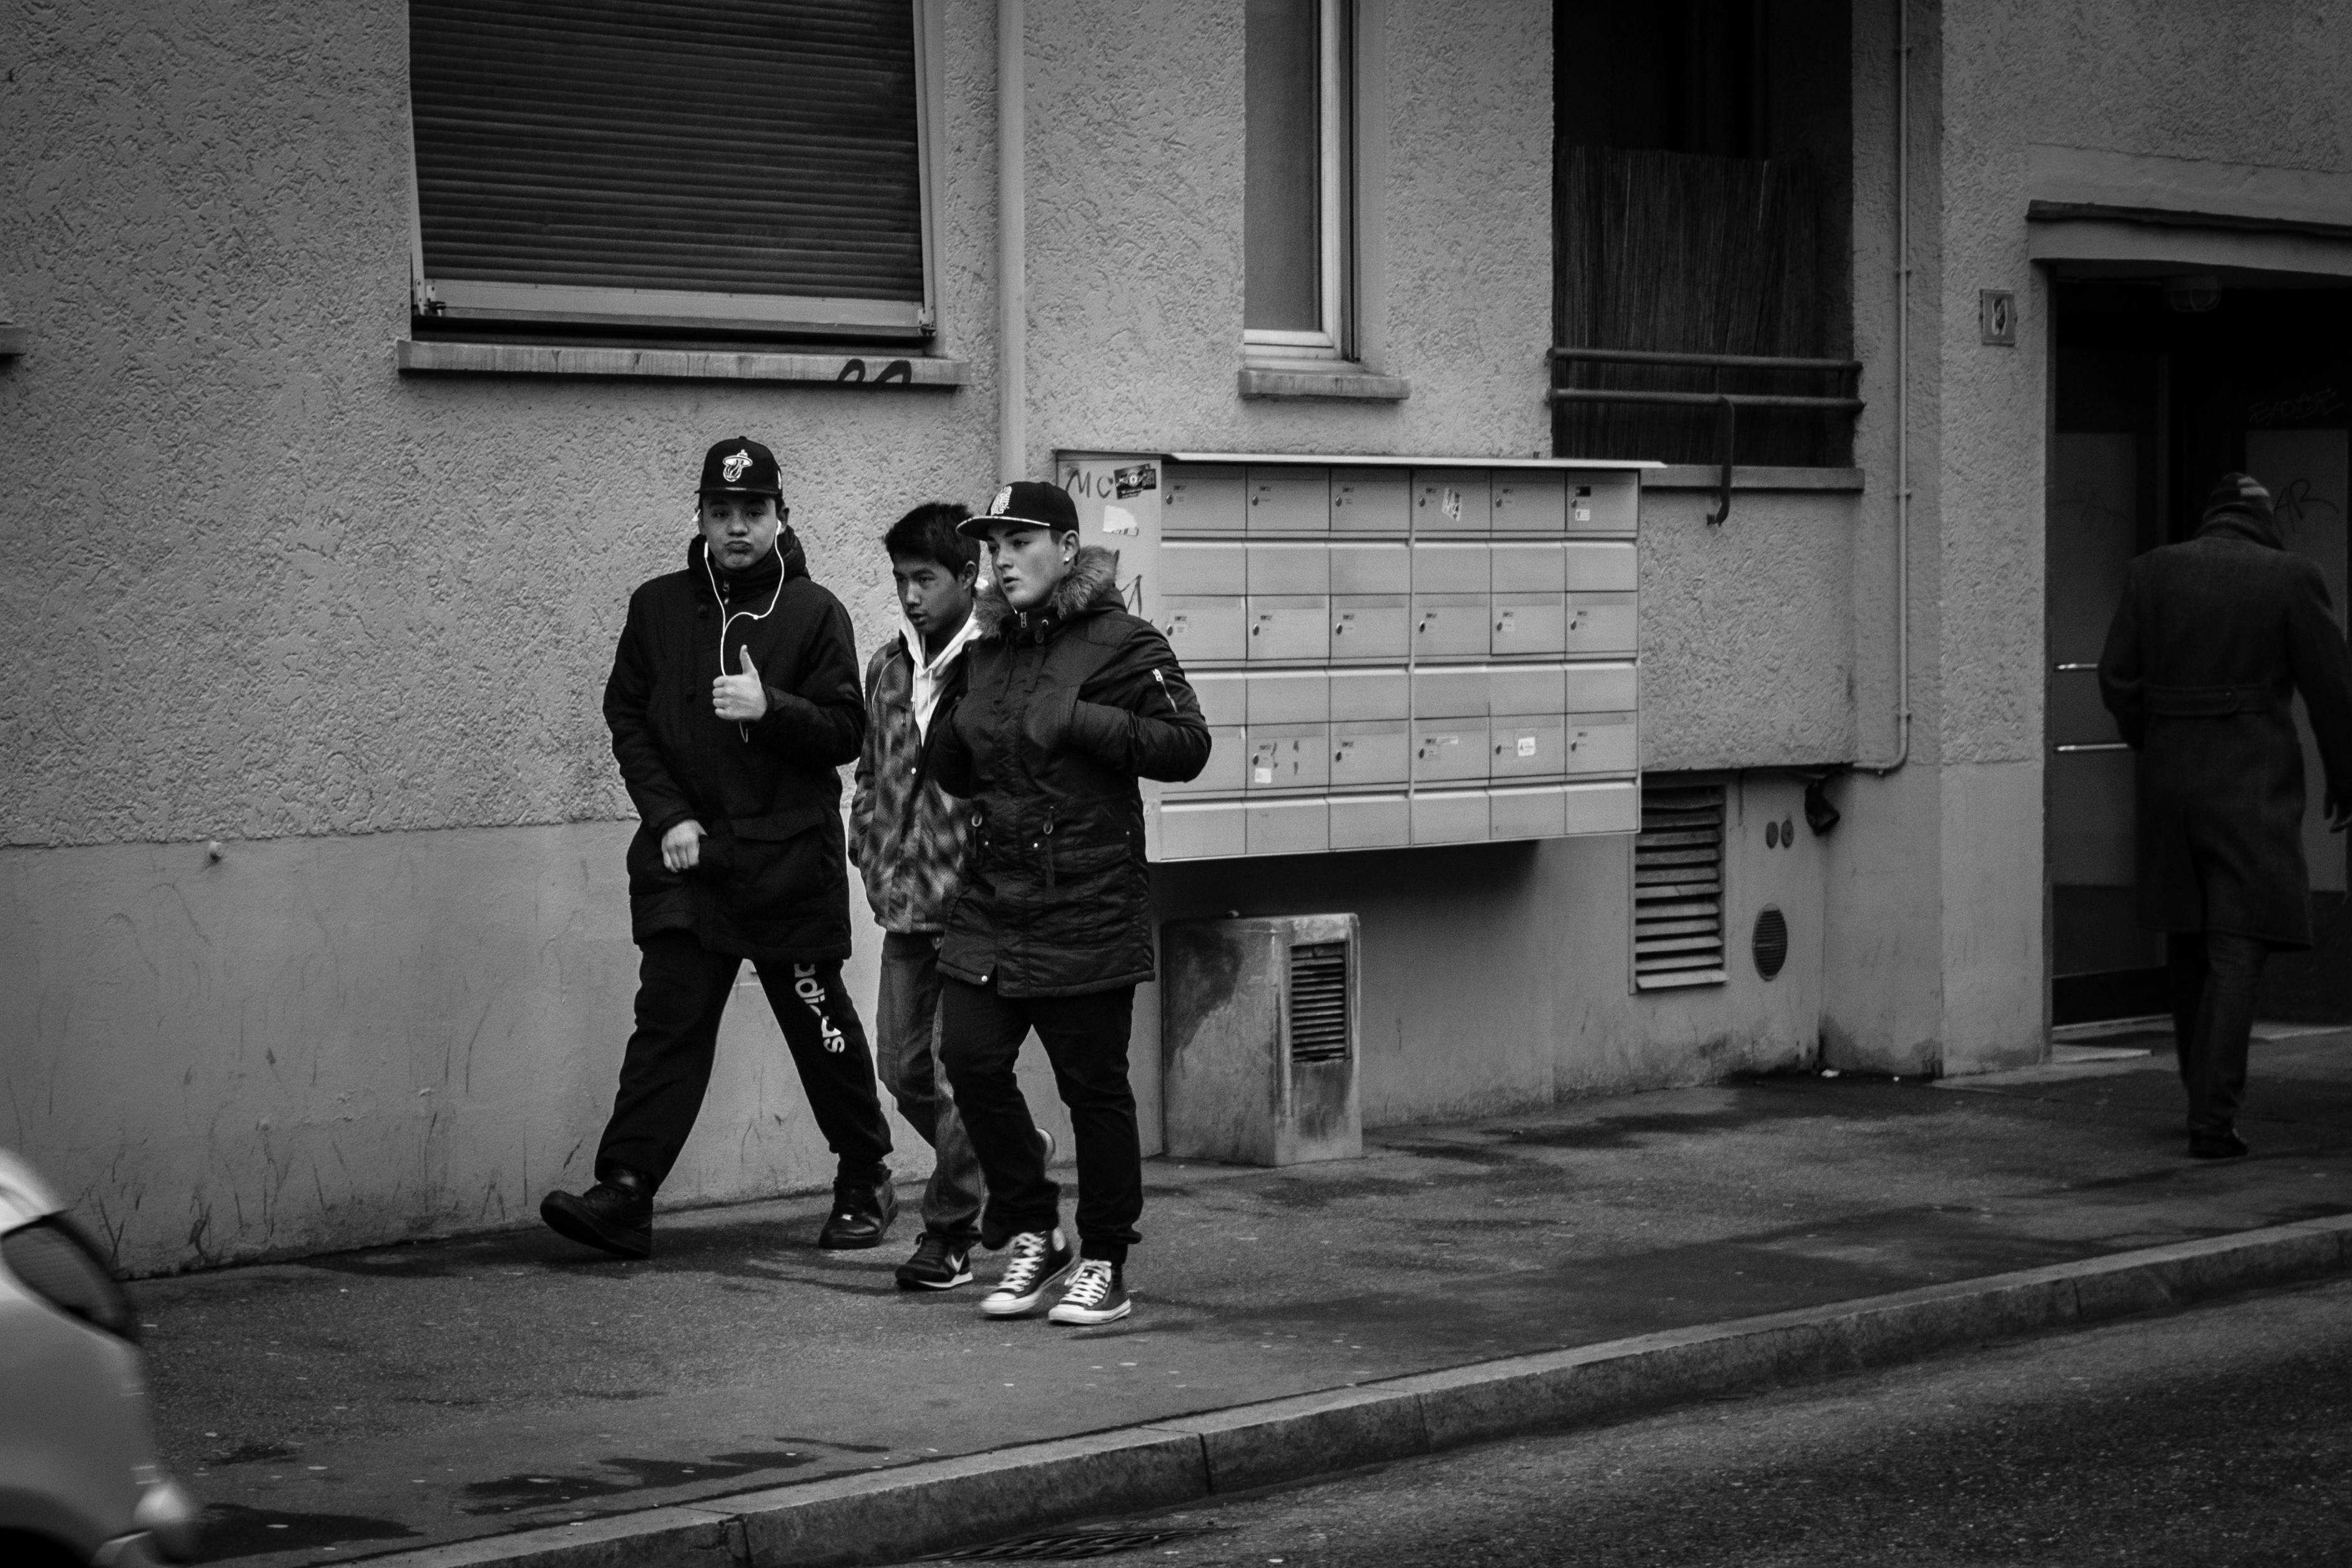 Fond D Ecran Nike Monochrome Fenetre Ville Rue